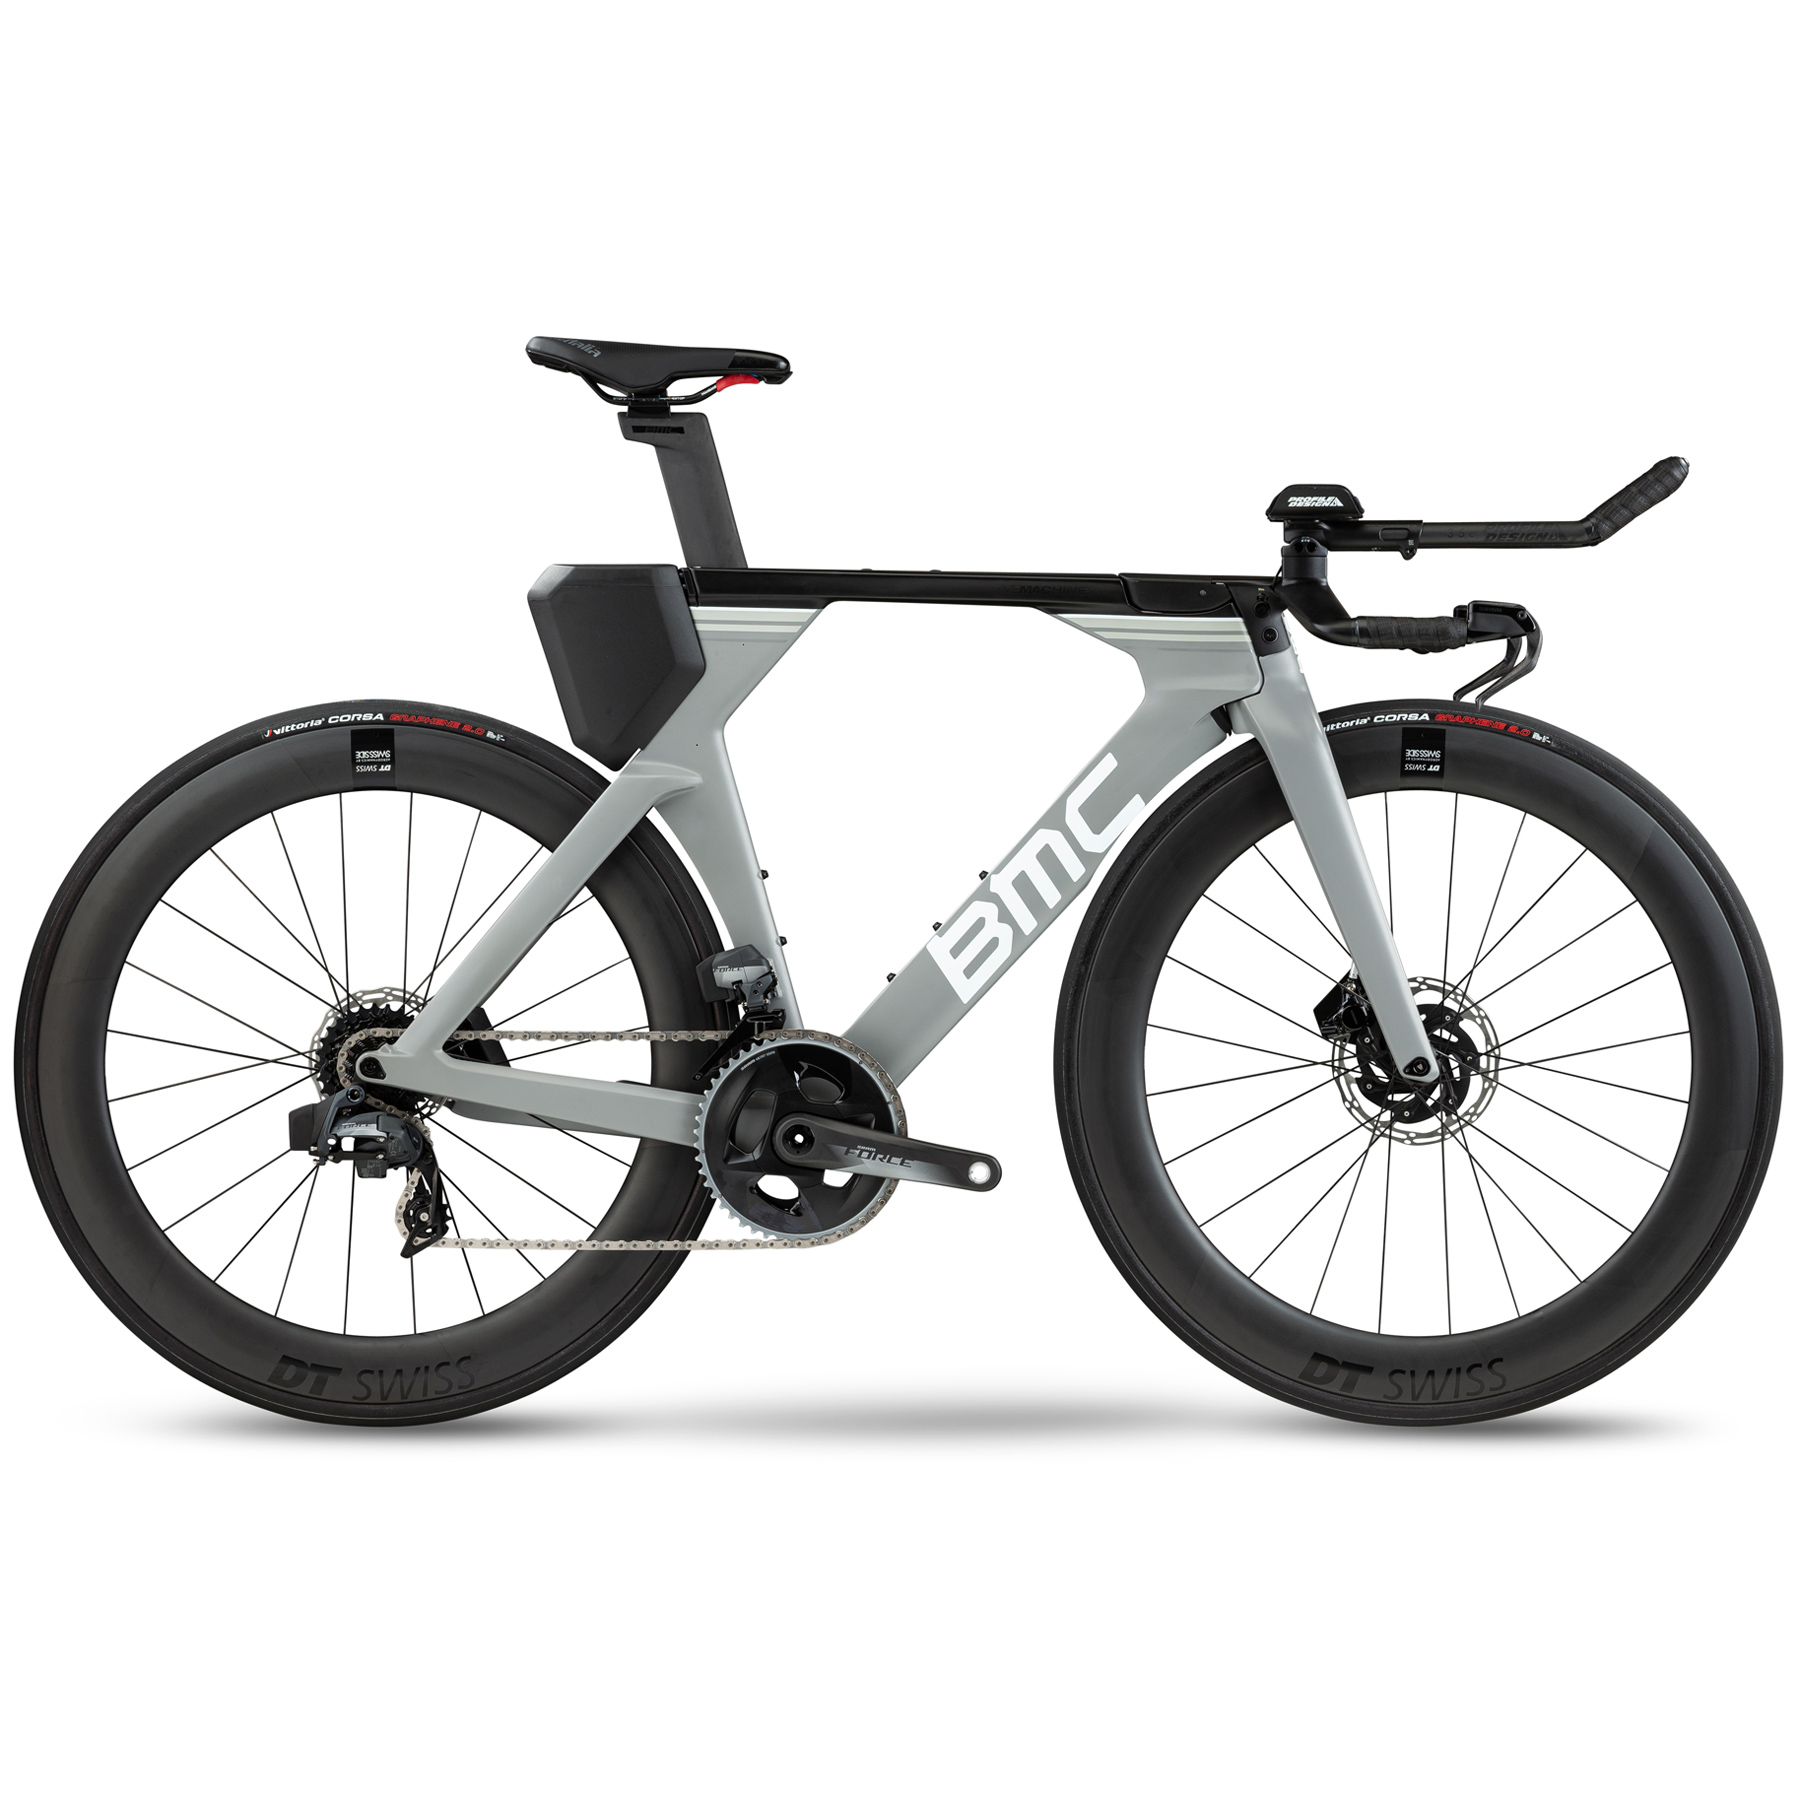 BMC TIMEMACHINE 01 DISC ONE - Force eTap AXS - Carbon Triathlonrad - 2021 - airforce grey & white